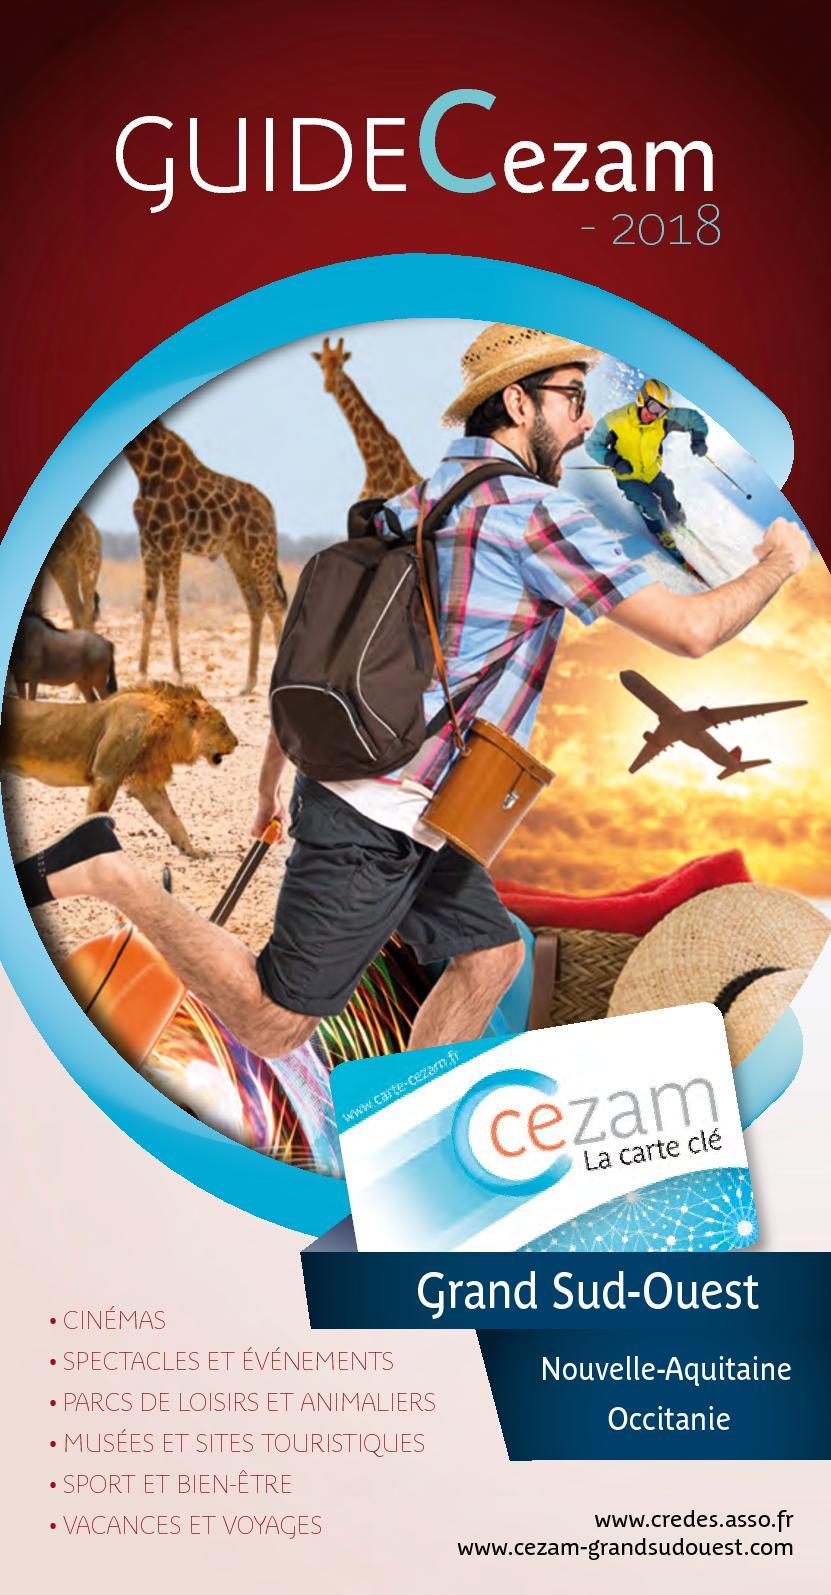 Carte Cezam Ticket Cinema.Calameo Guide Cezam Grand Sud Ouest 2018 Web